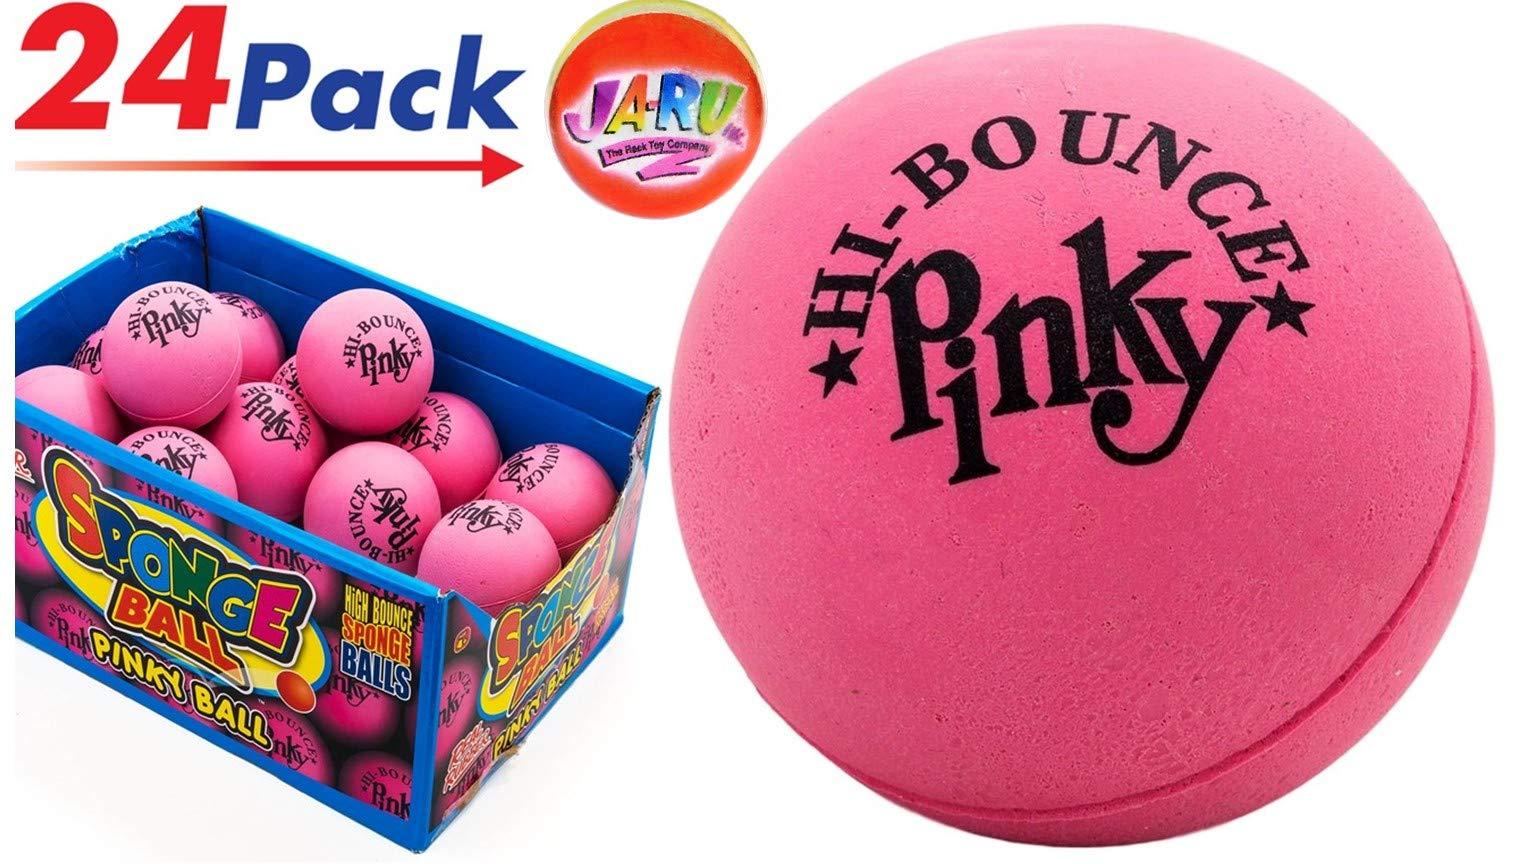 JA-RU Pinky Ball Massage (Pack of 24 with Display Box) Hi Bounce Pinky Ball 2.5'' Large Pink Rubber Ball Plus 1 Small Item #976-24p